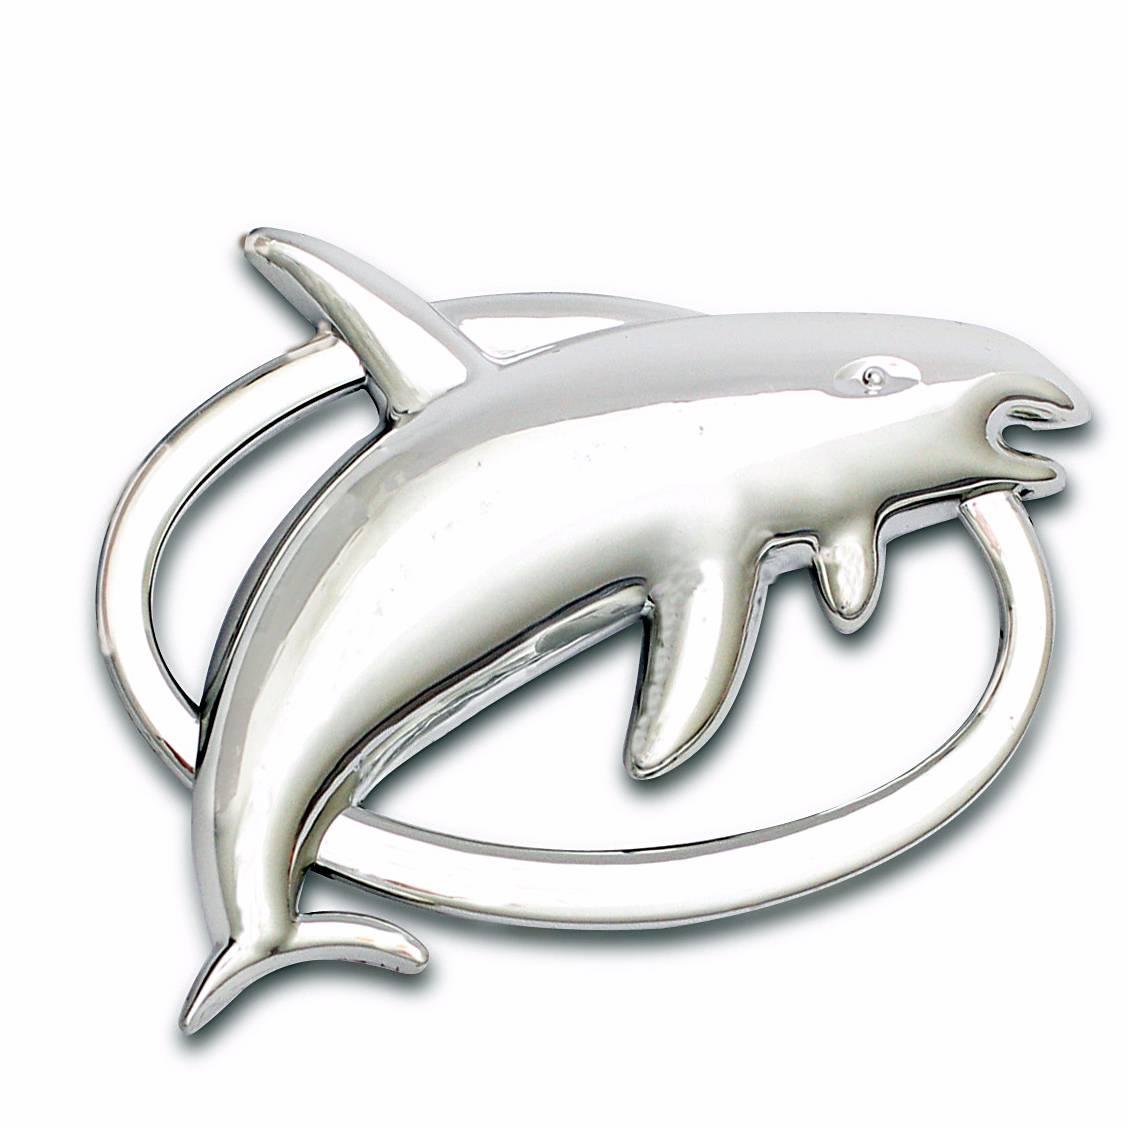 Emblem Variasi Dolphin